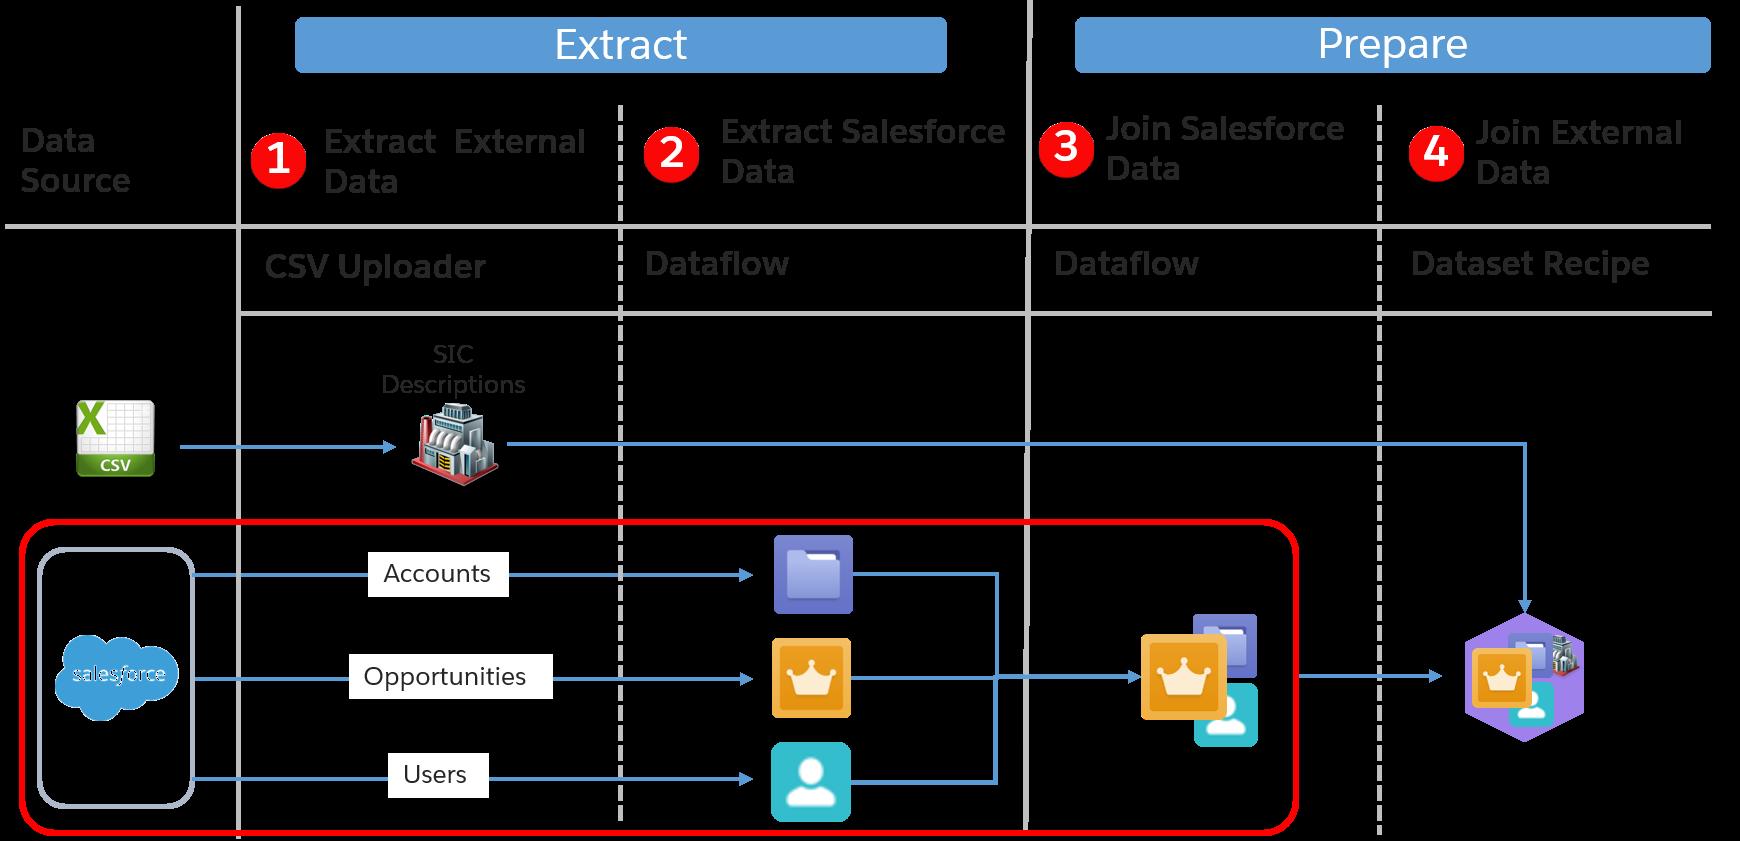 Salesforce オブジェクトの抽出プロセスが強調表示されているデータジャーニーマップ